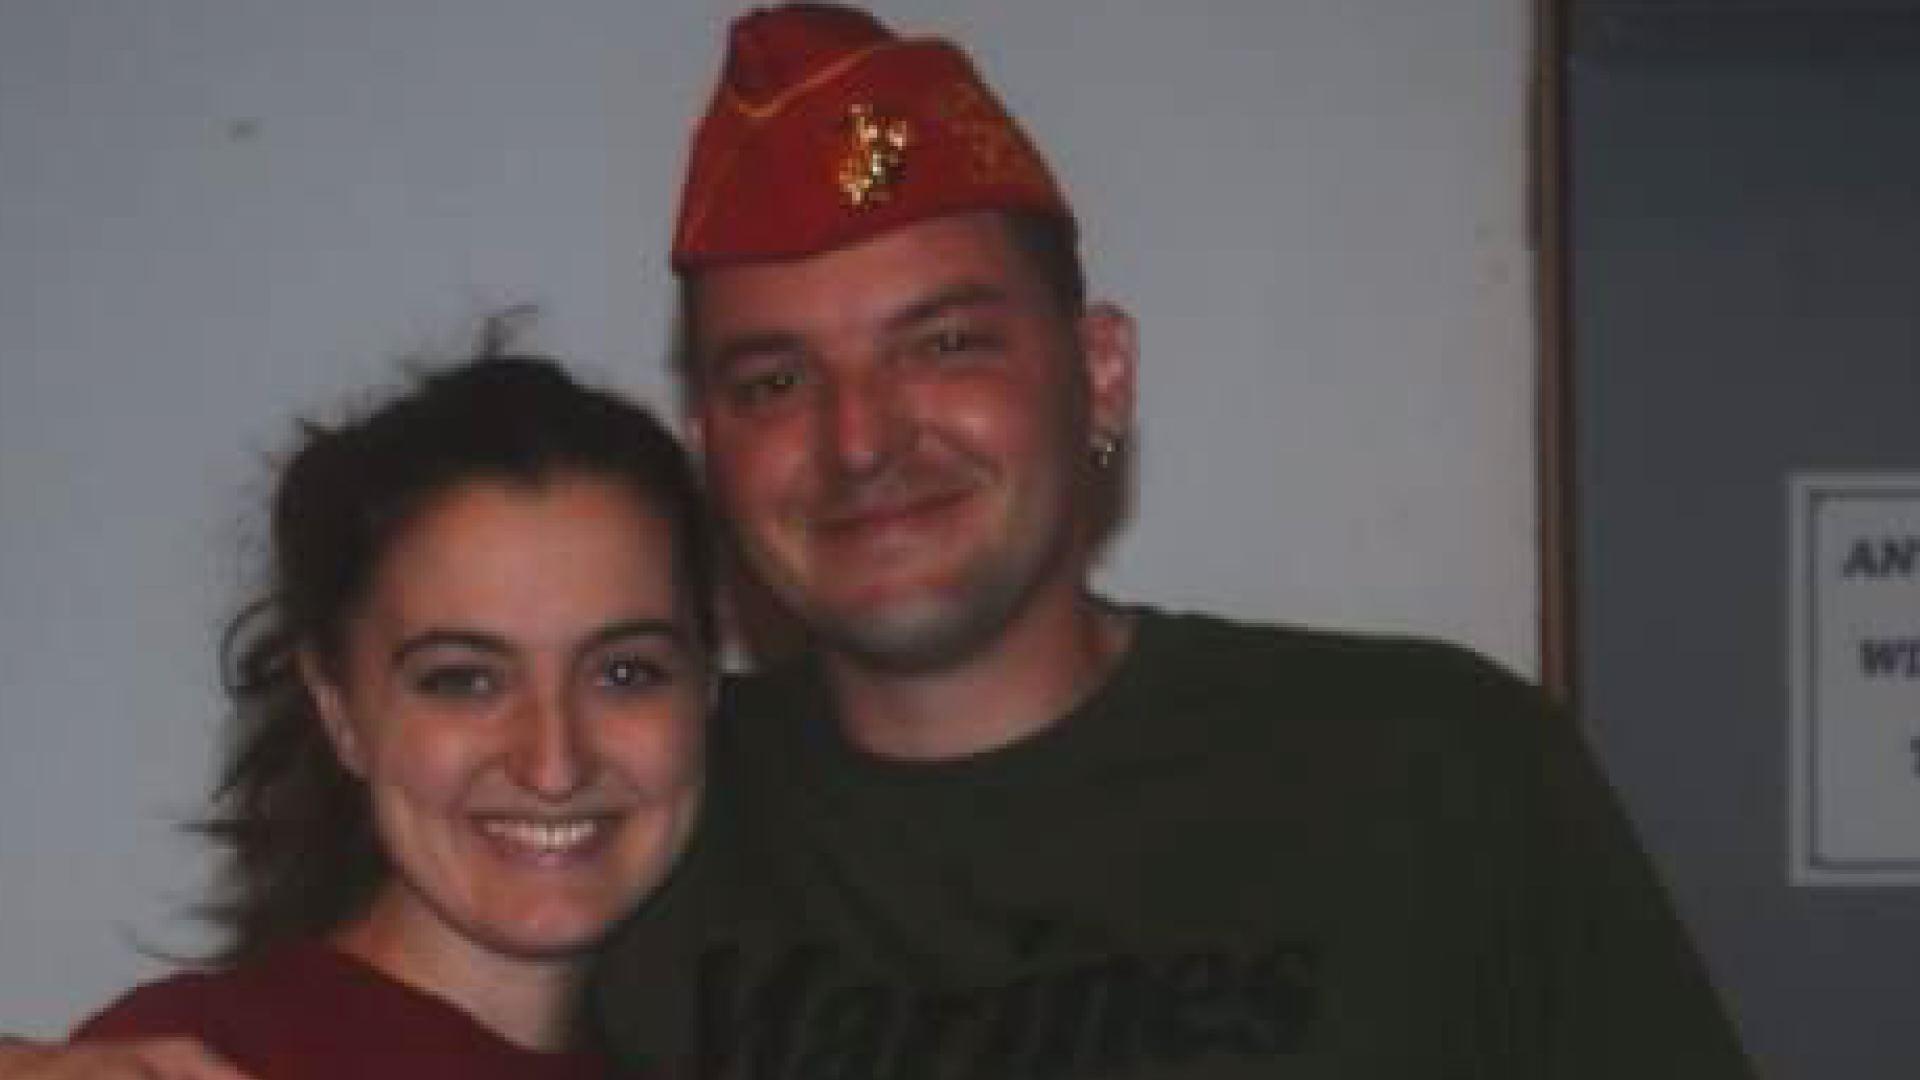 Joanna Eldridge is pictured here with her late husband, Marine Justin Eldridge.